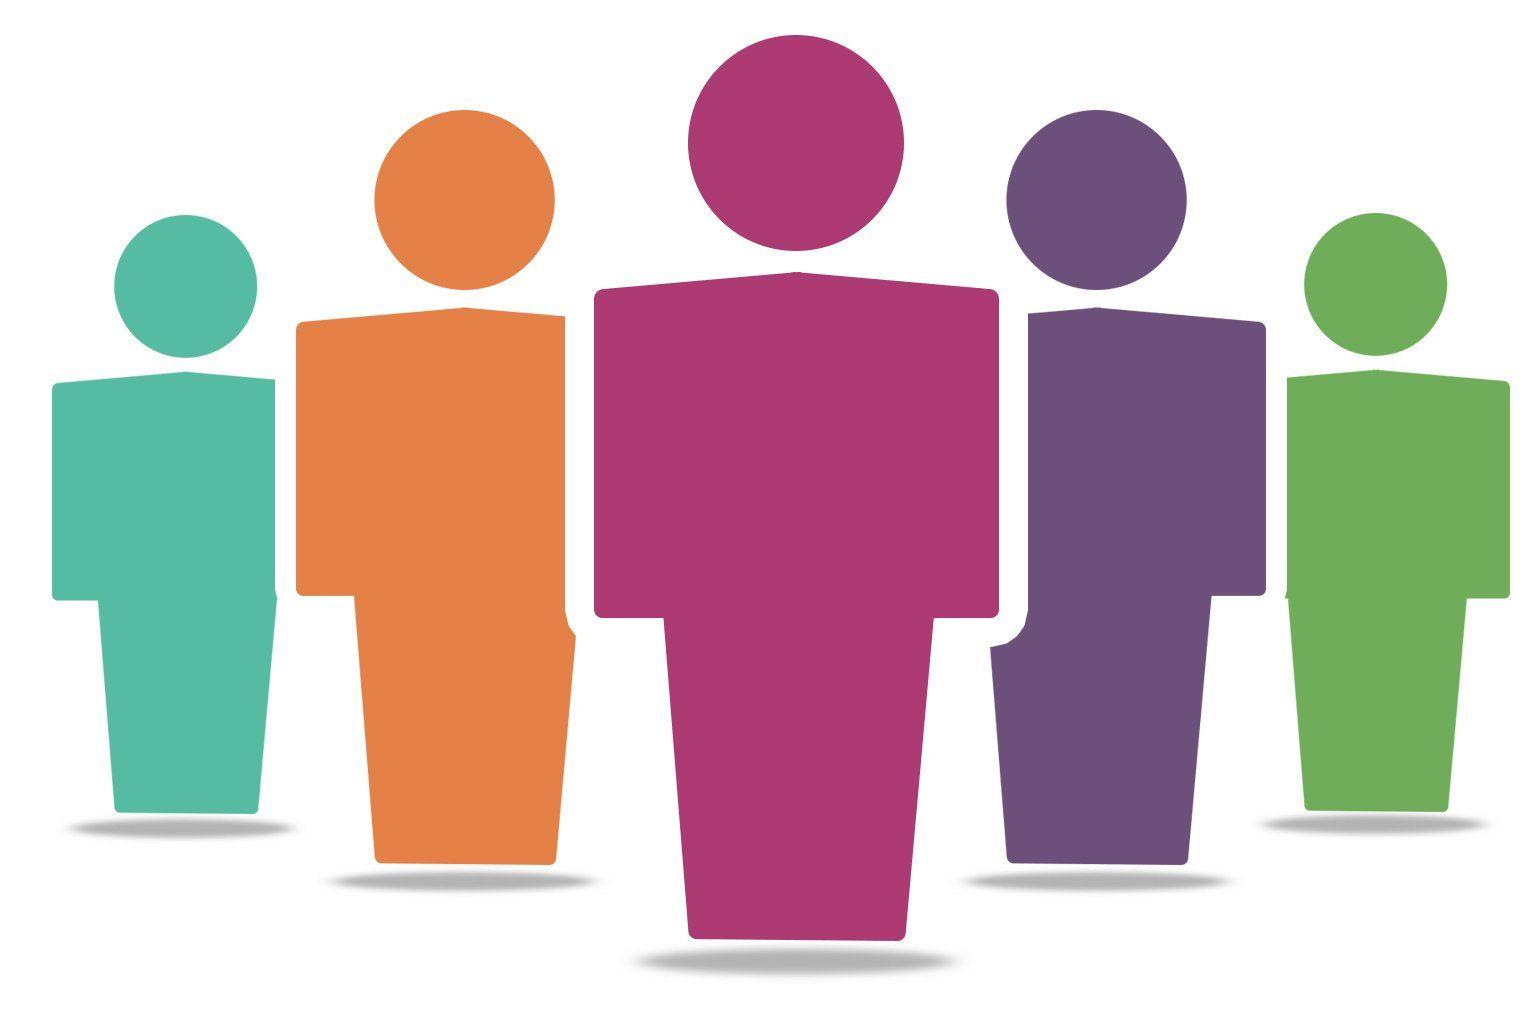 colour_people_icons_free_ubersocialmedia-people